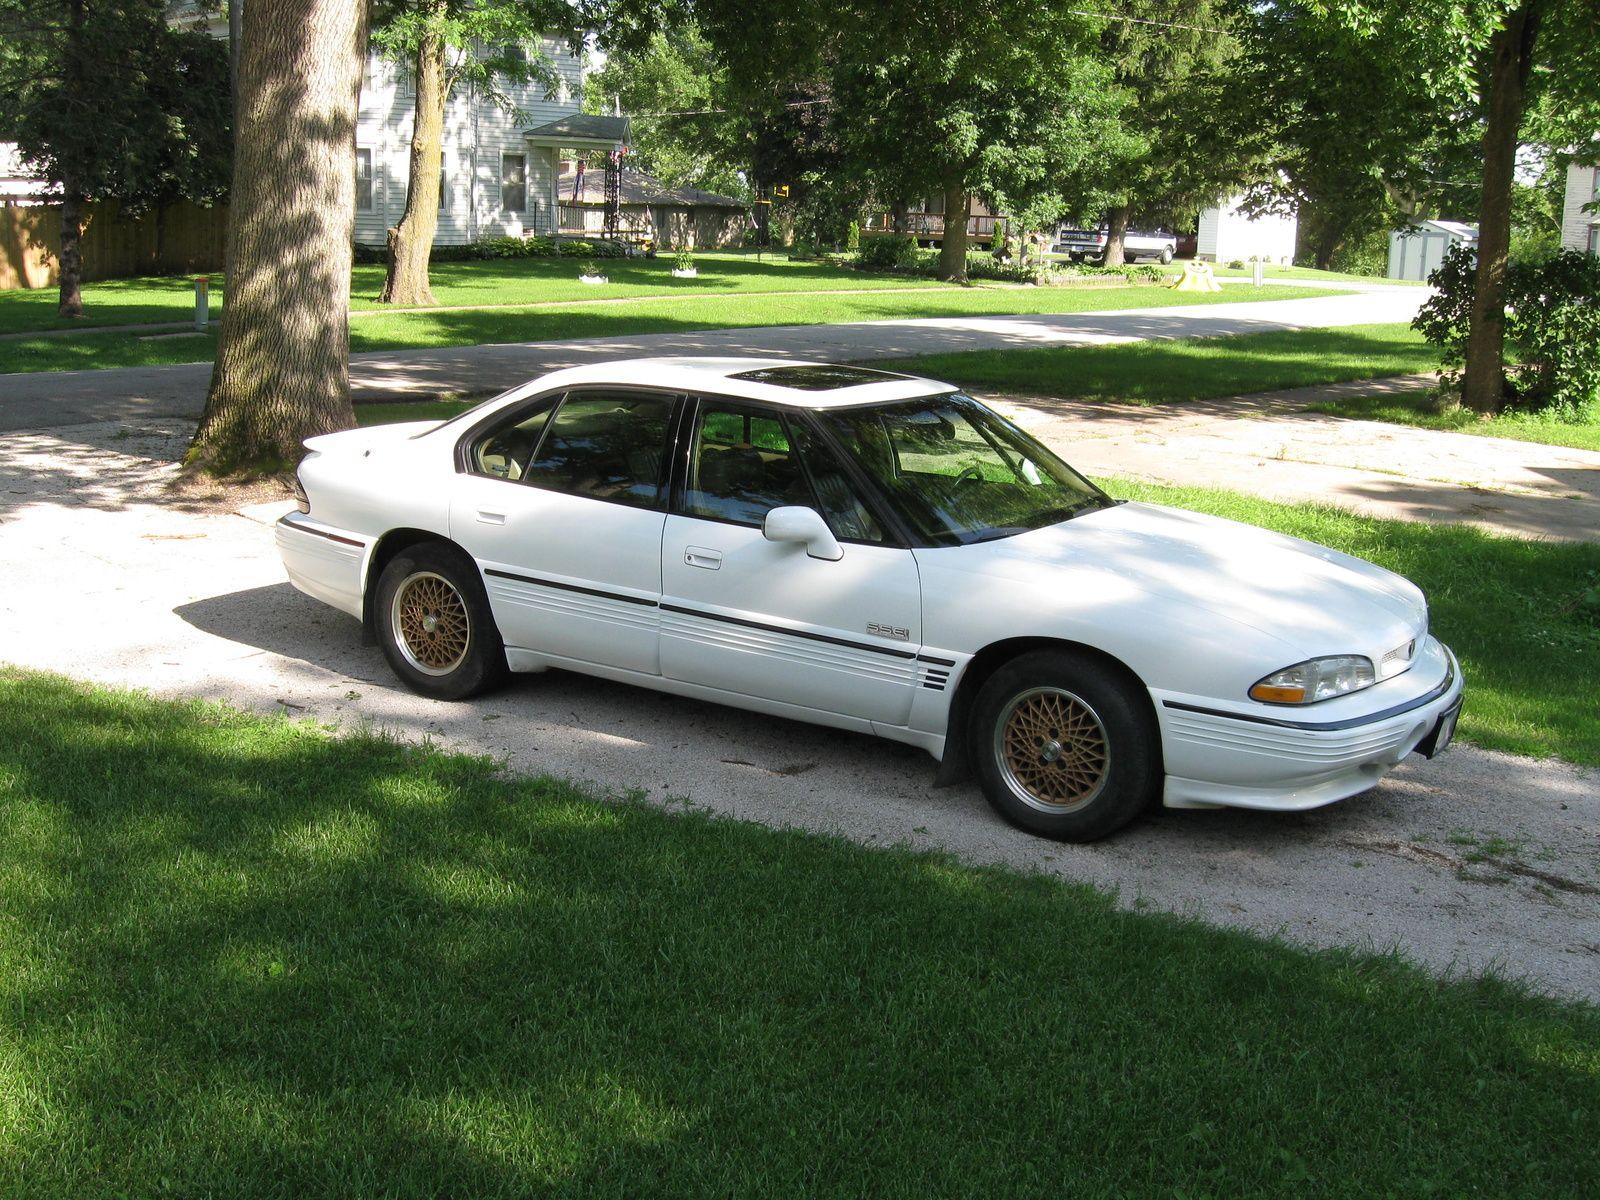 5fz58pn44nvsbm https www mycarspecs com car 1998 pontiac bonneville base sse